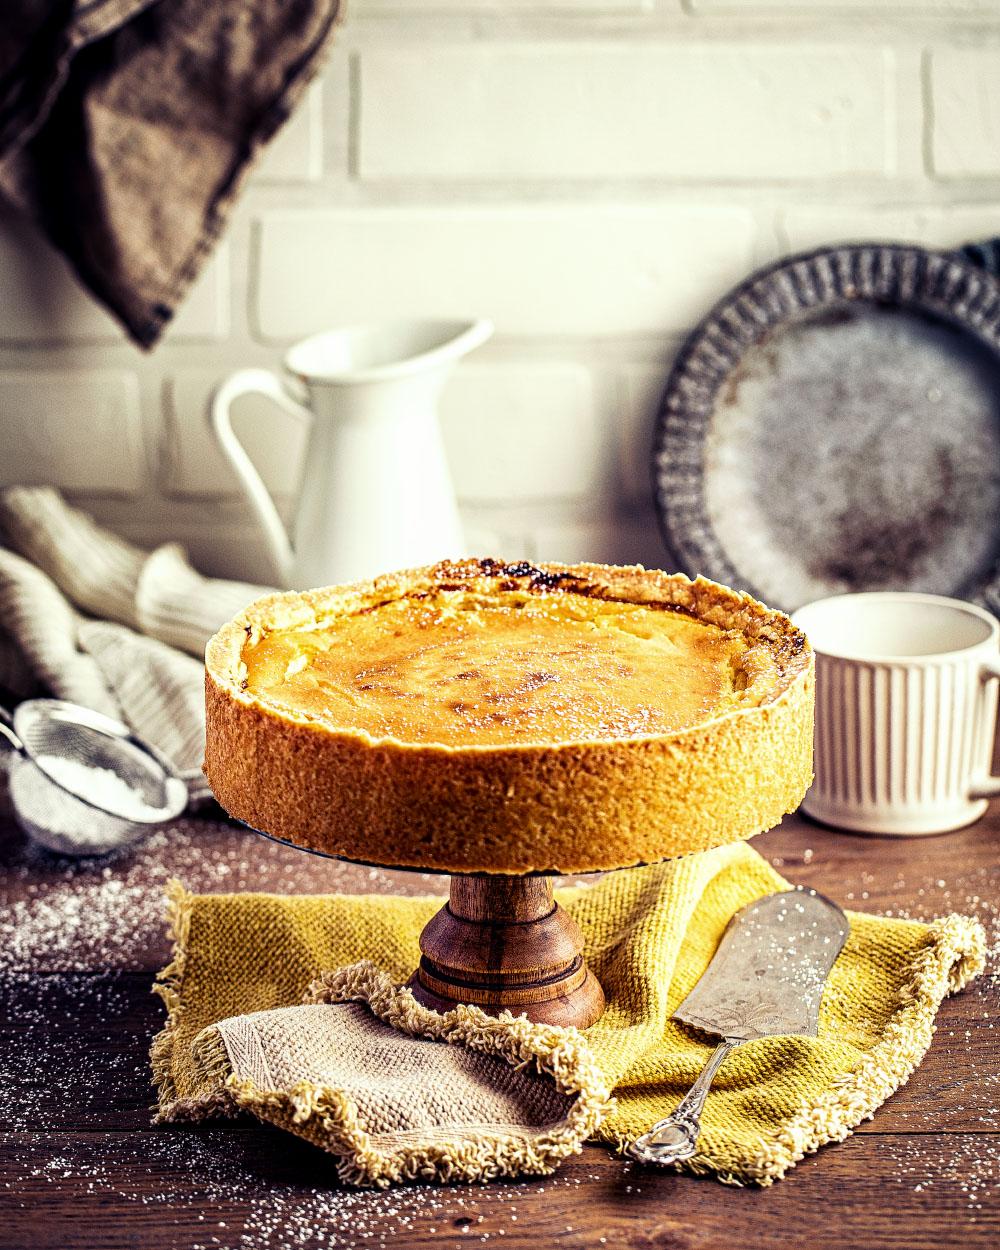 der kaesekuchen der immer gelingt gelingsicher käsekuchen einfaches rezept laktosefrei